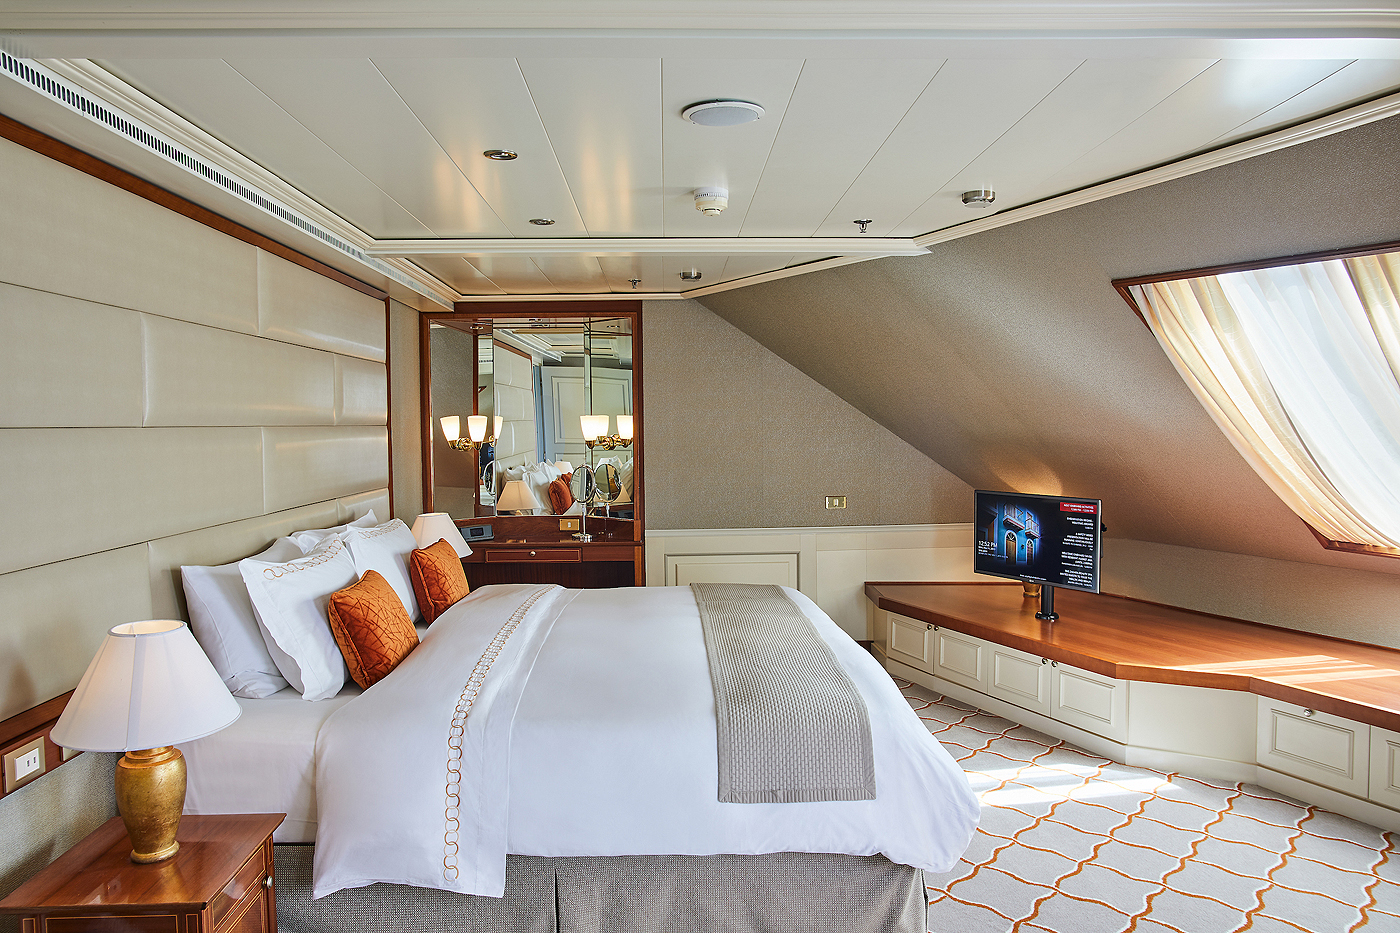 Royal Suite R1 / R2 2 Schlafzimmer - Silver Whisper - Bild 4 - Thumb